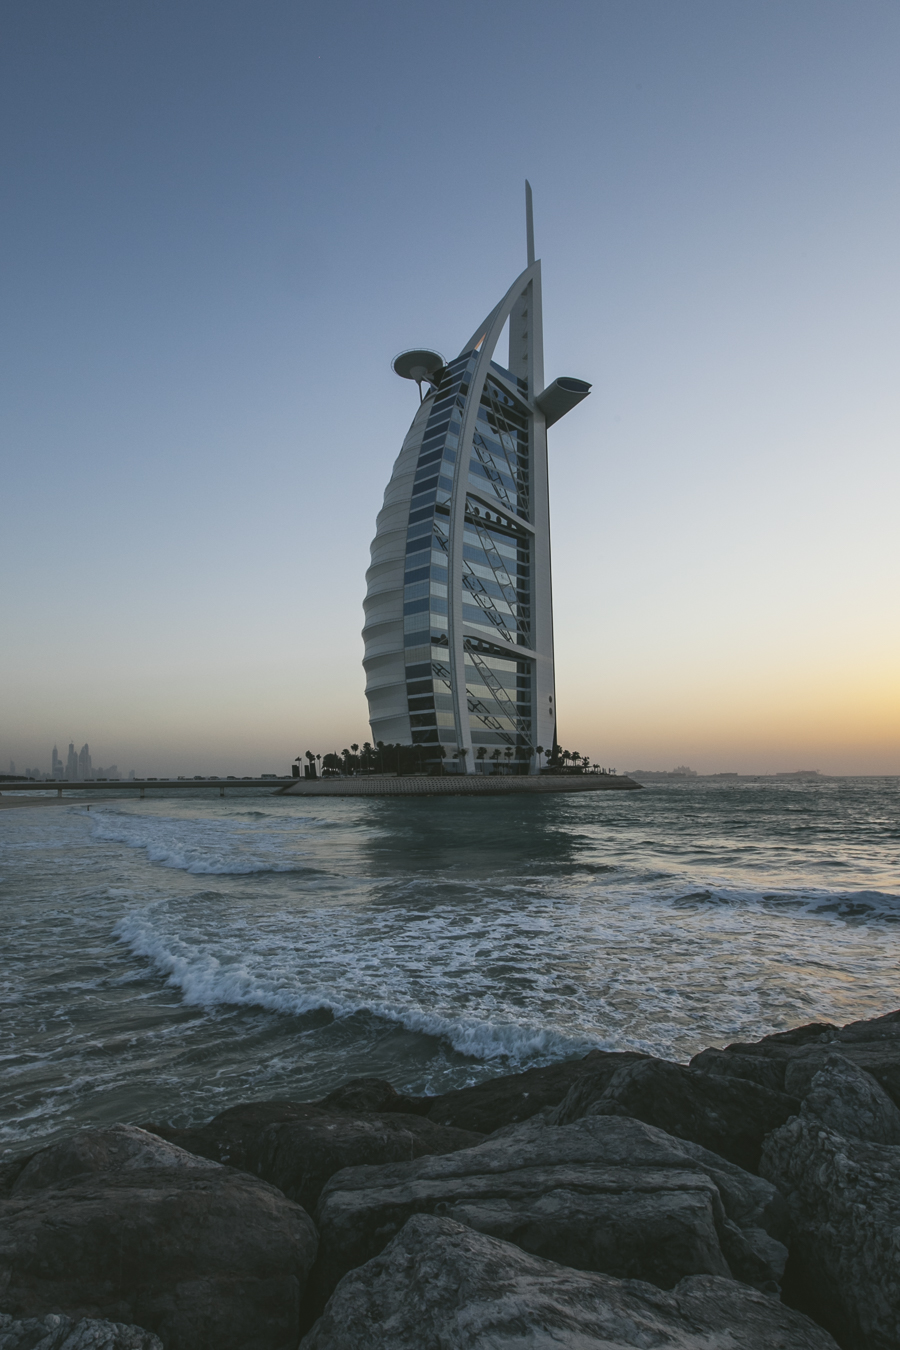 Burj Al Arab Hotel, Dubai, UAE.